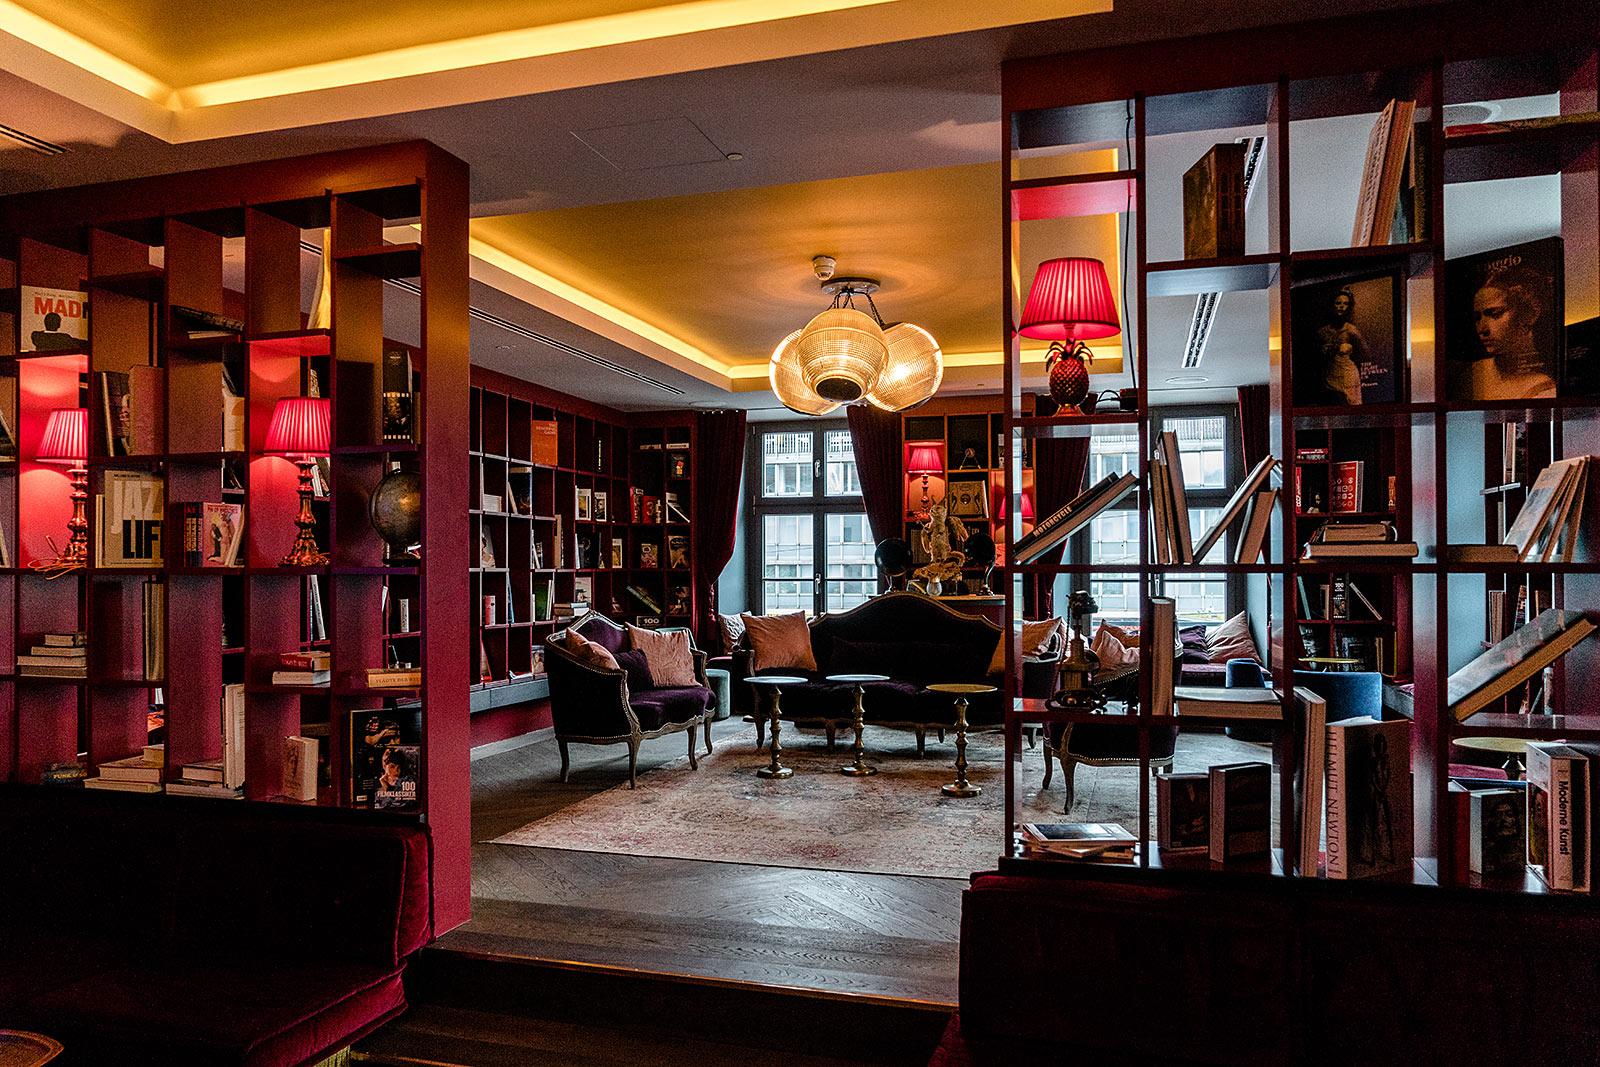 bibliothek 25hours hotel münchen the royal bavarian travel blog sunnyinga